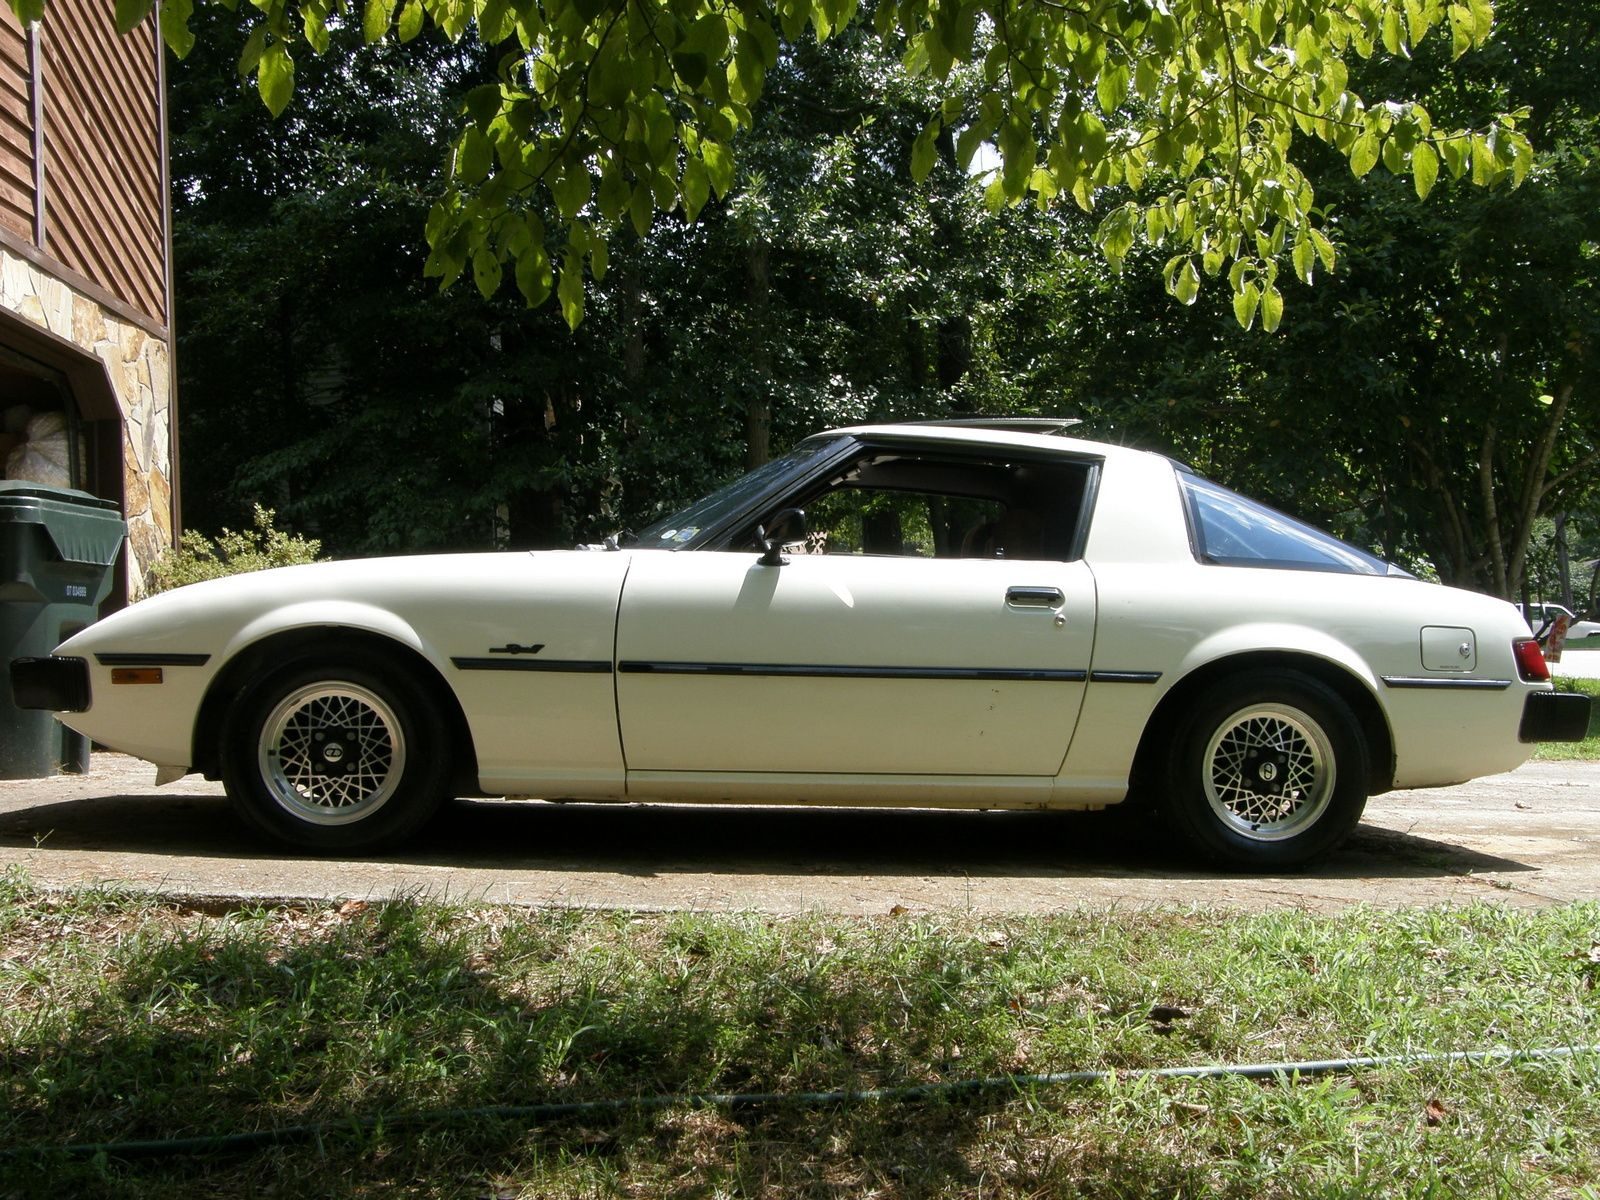 1980 Mazda RX-7 (FB) www.southbaymazda.com | Old School Mazda ...